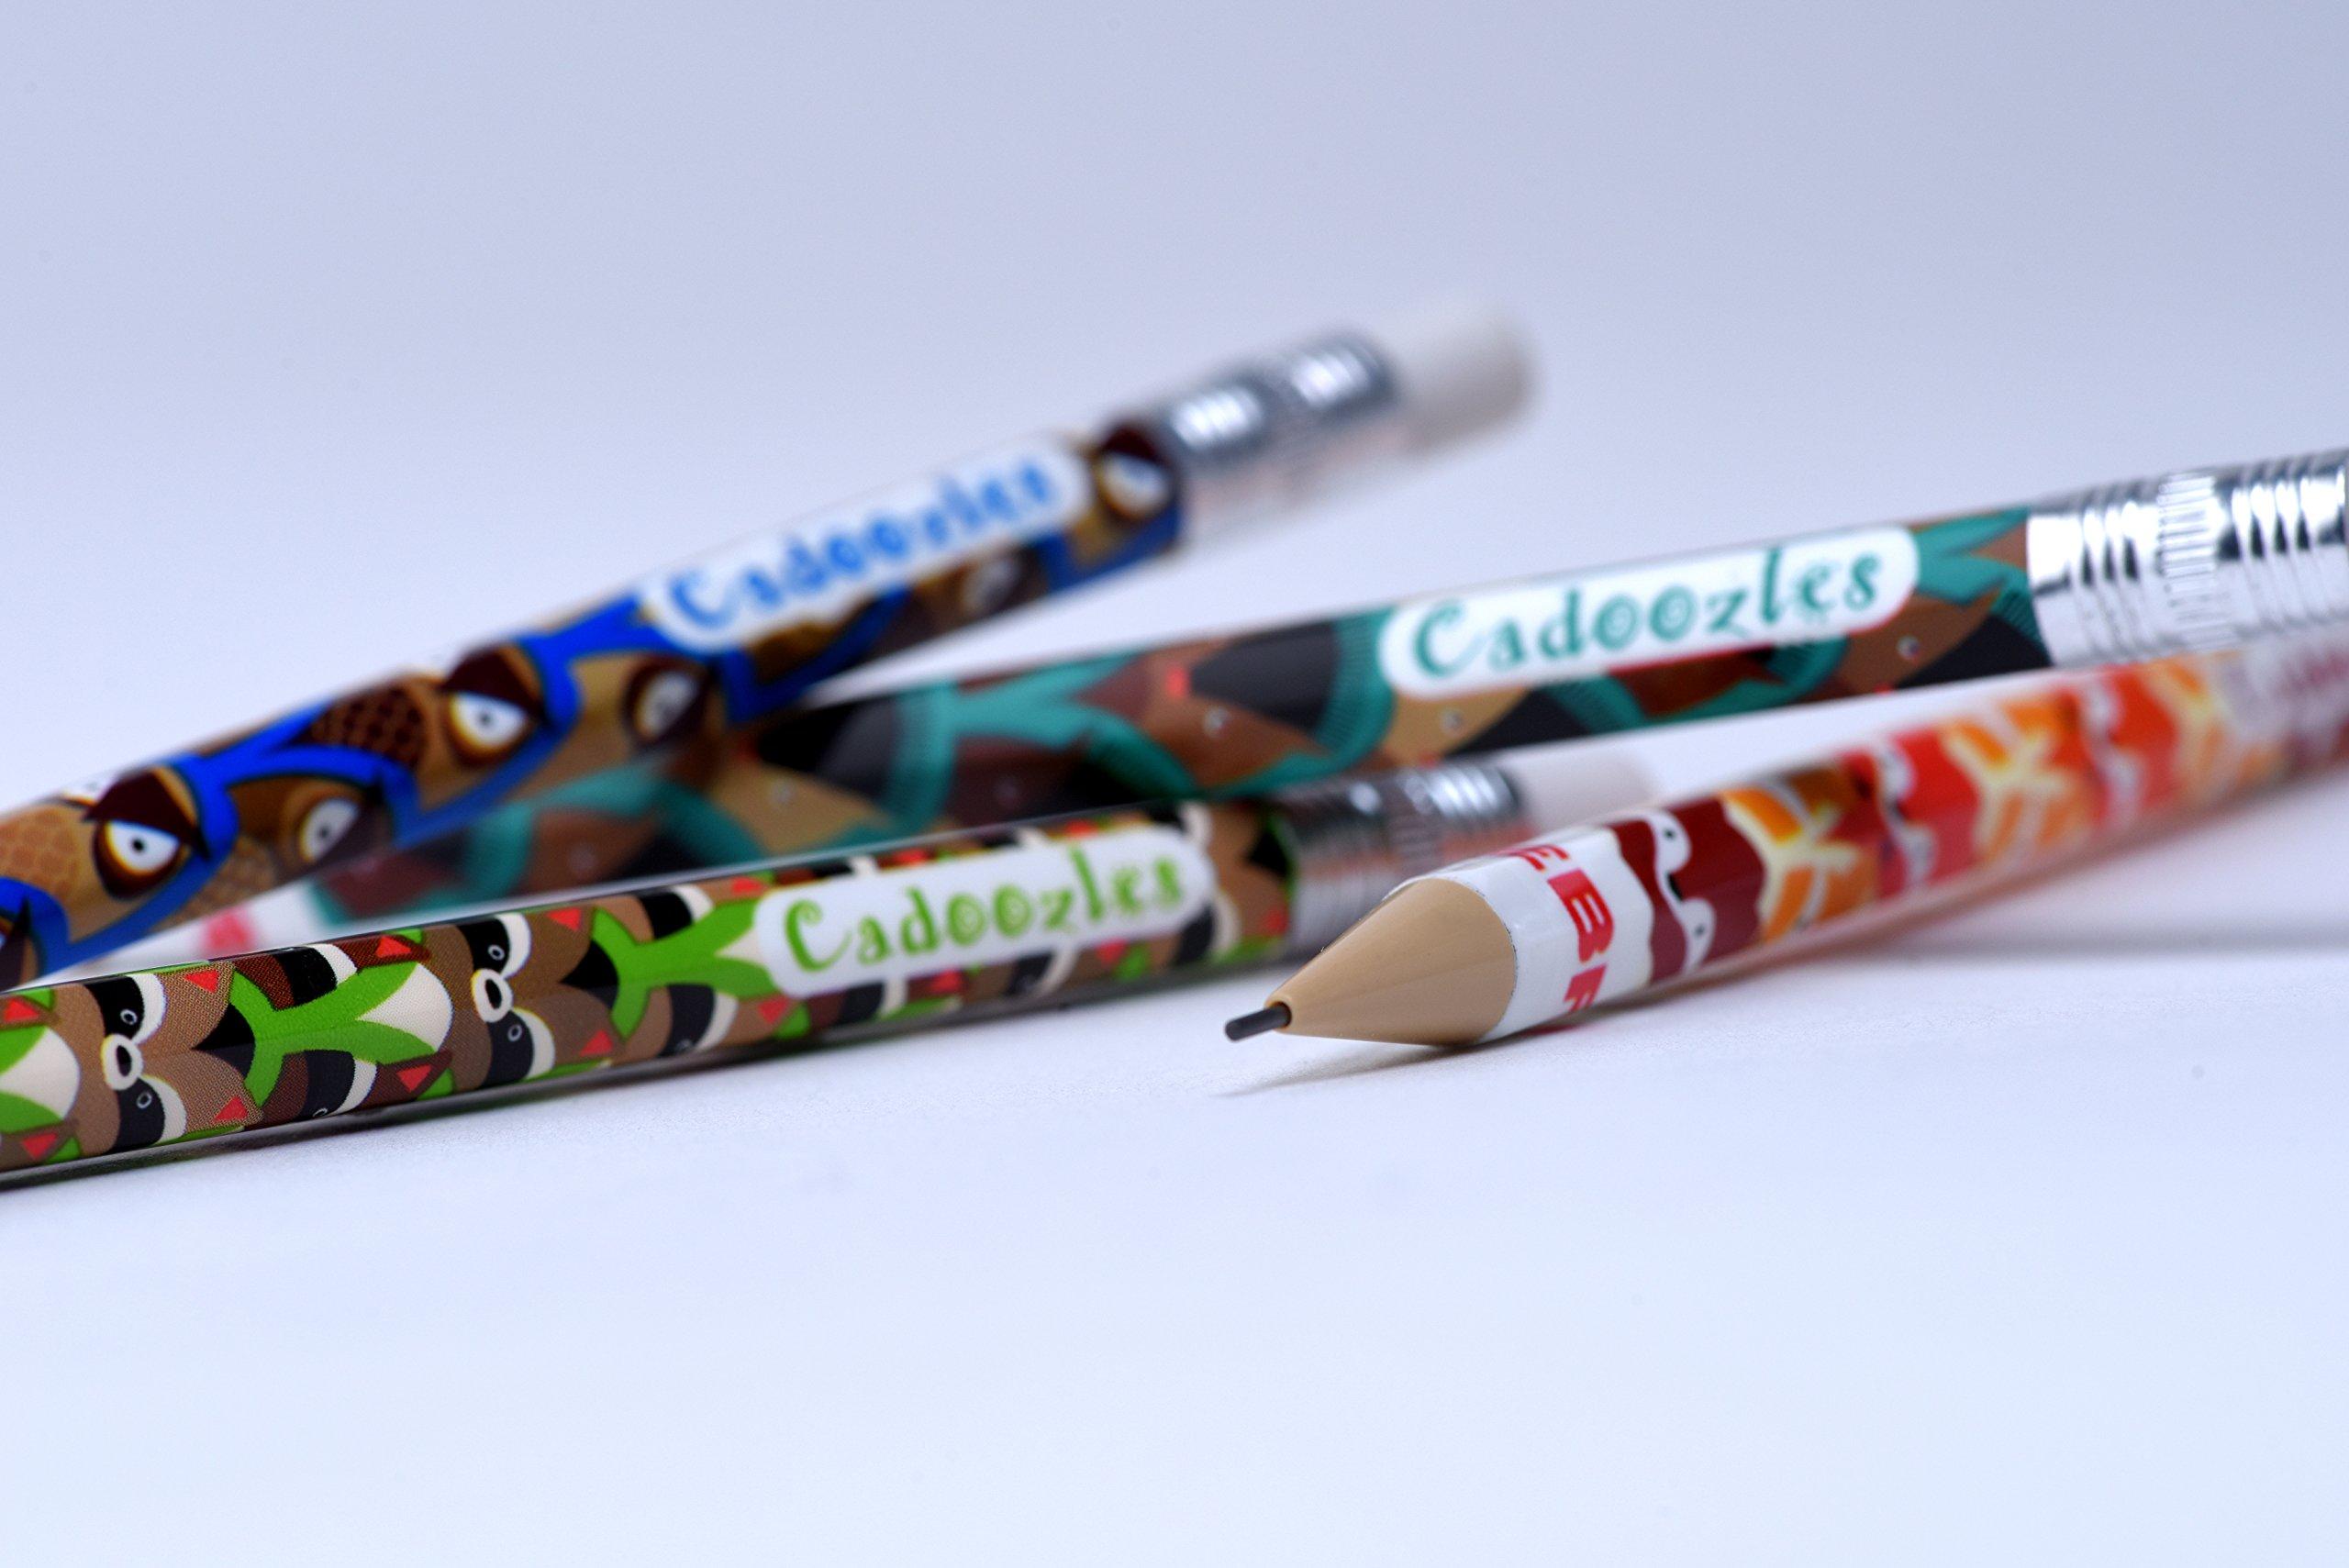 Zebra Cadoozles Mechanical Pencil Eraser Refills, White, 12-Piece Pouch, 30-Count (360 Pieces Total) by Zebra Pen (Image #3)